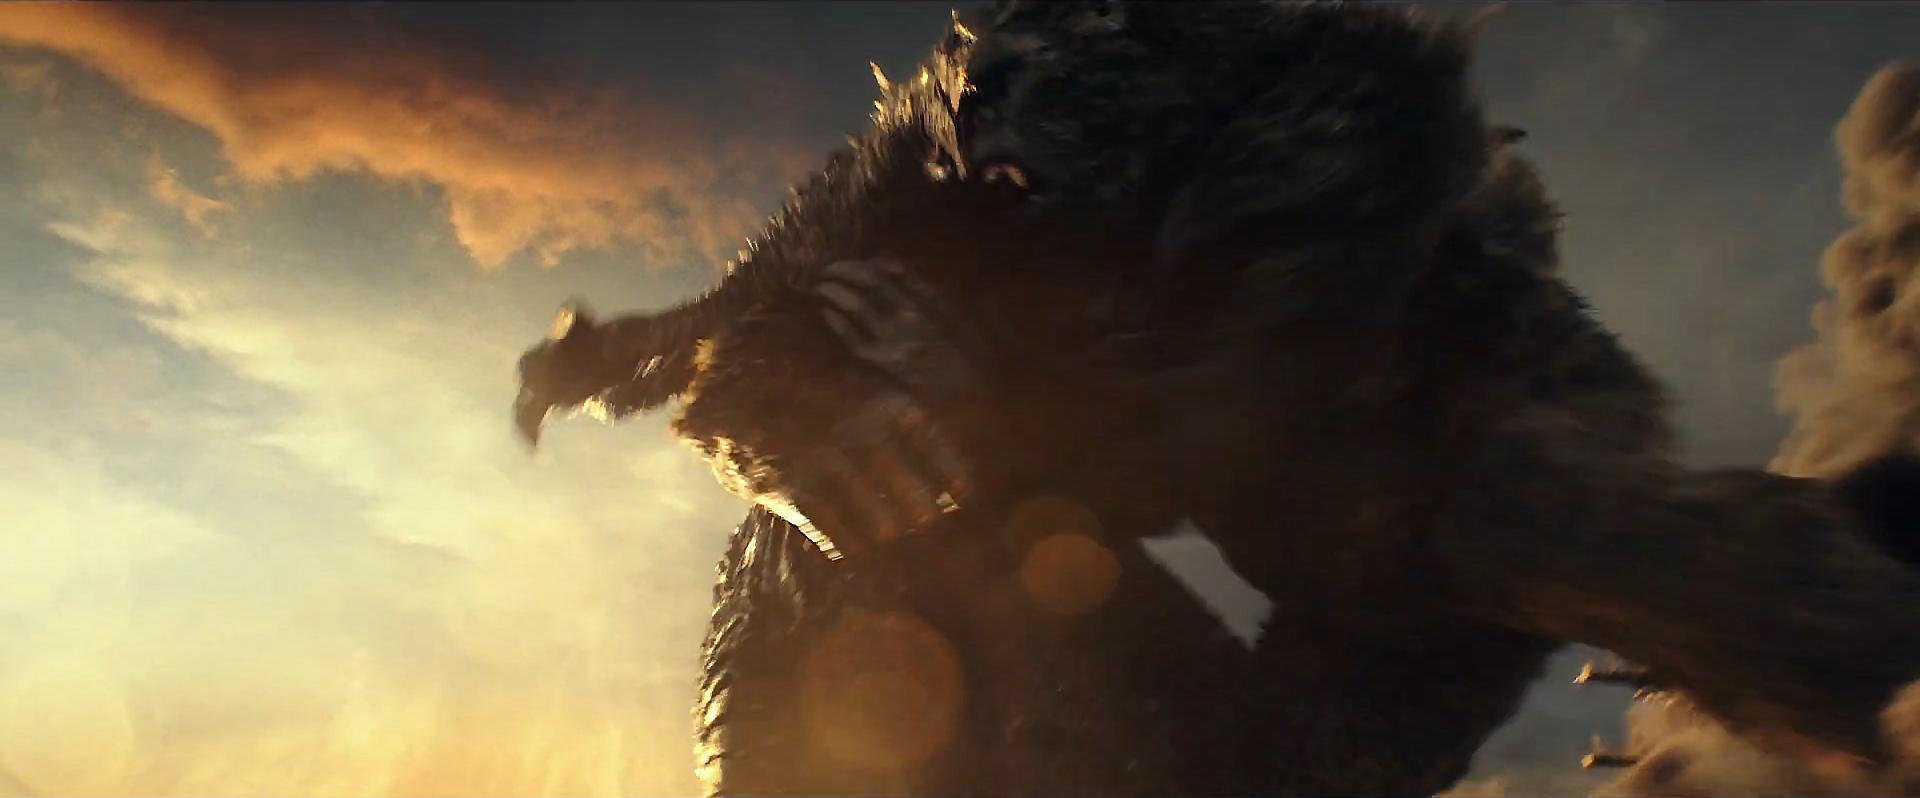 Godzilla vs Kong Trailer Still 42 - Kong fights Godzilla